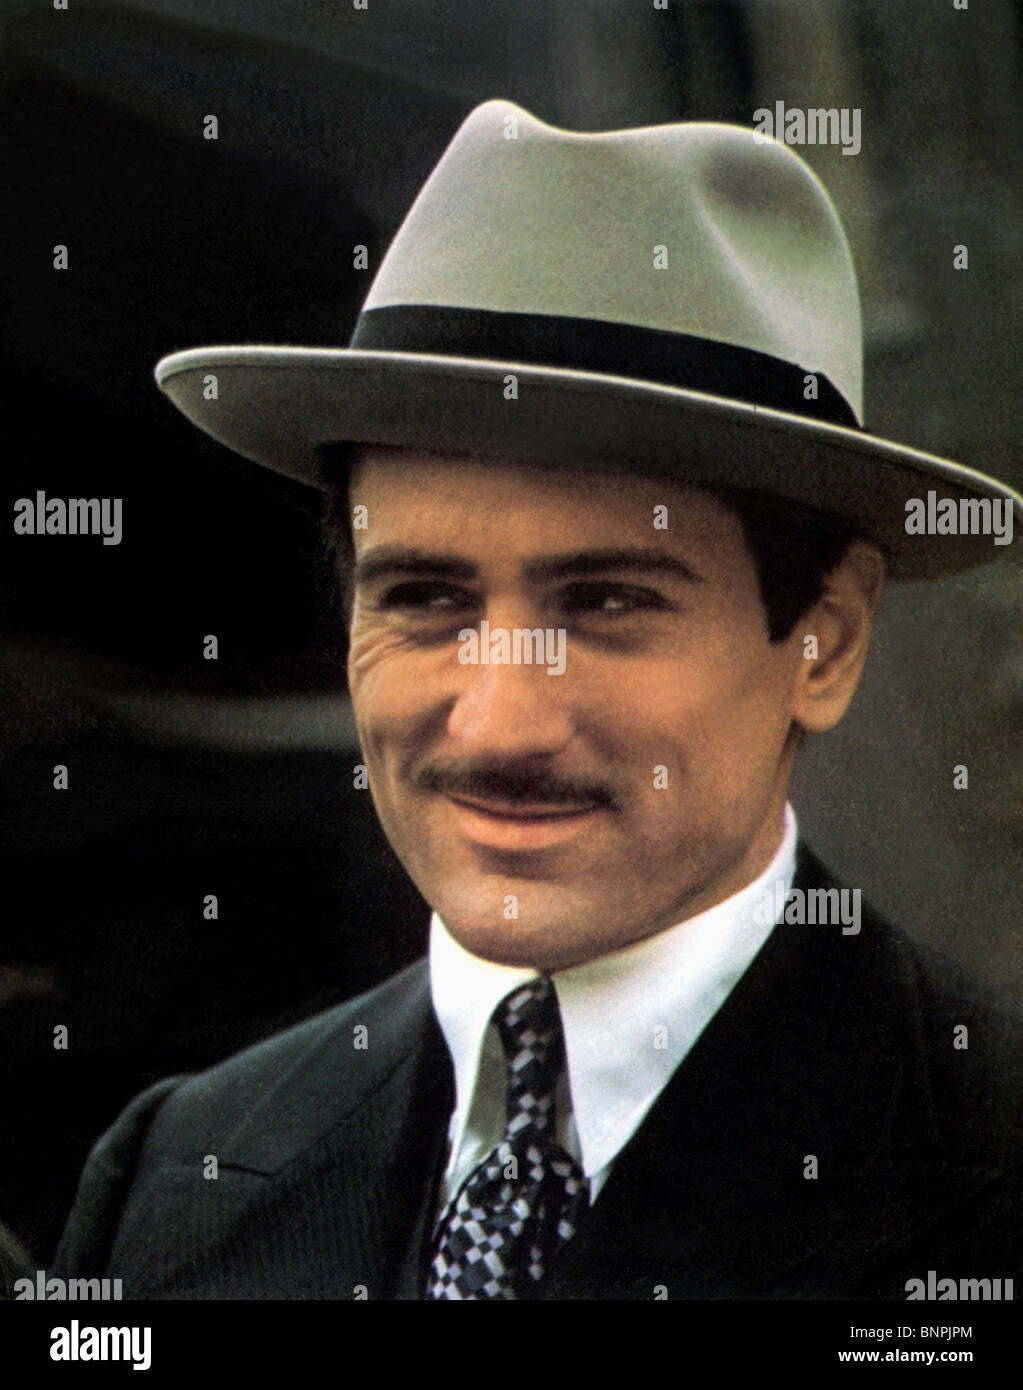 Robert De Niro Der Pate Teil Ii 1974 Stockfoto Bild 30615836 Alamy